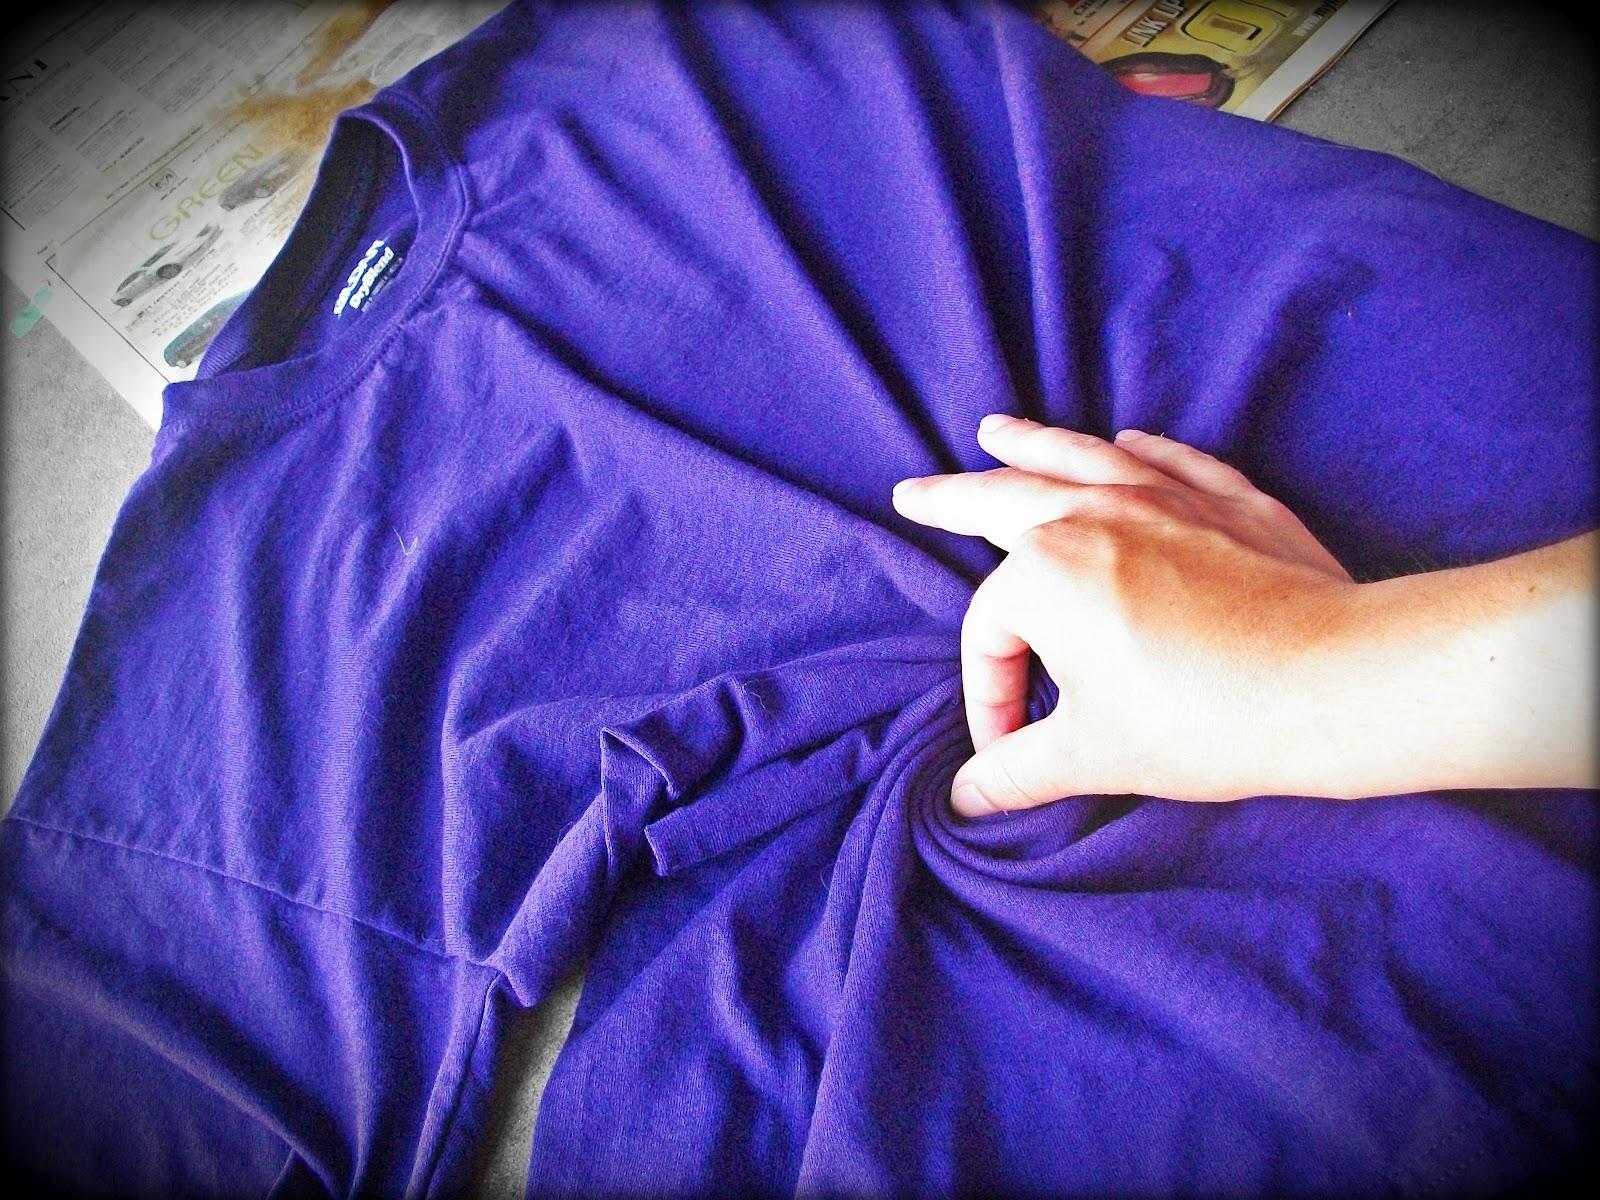 Shirt design using bleach - Tie Dying With Bleach